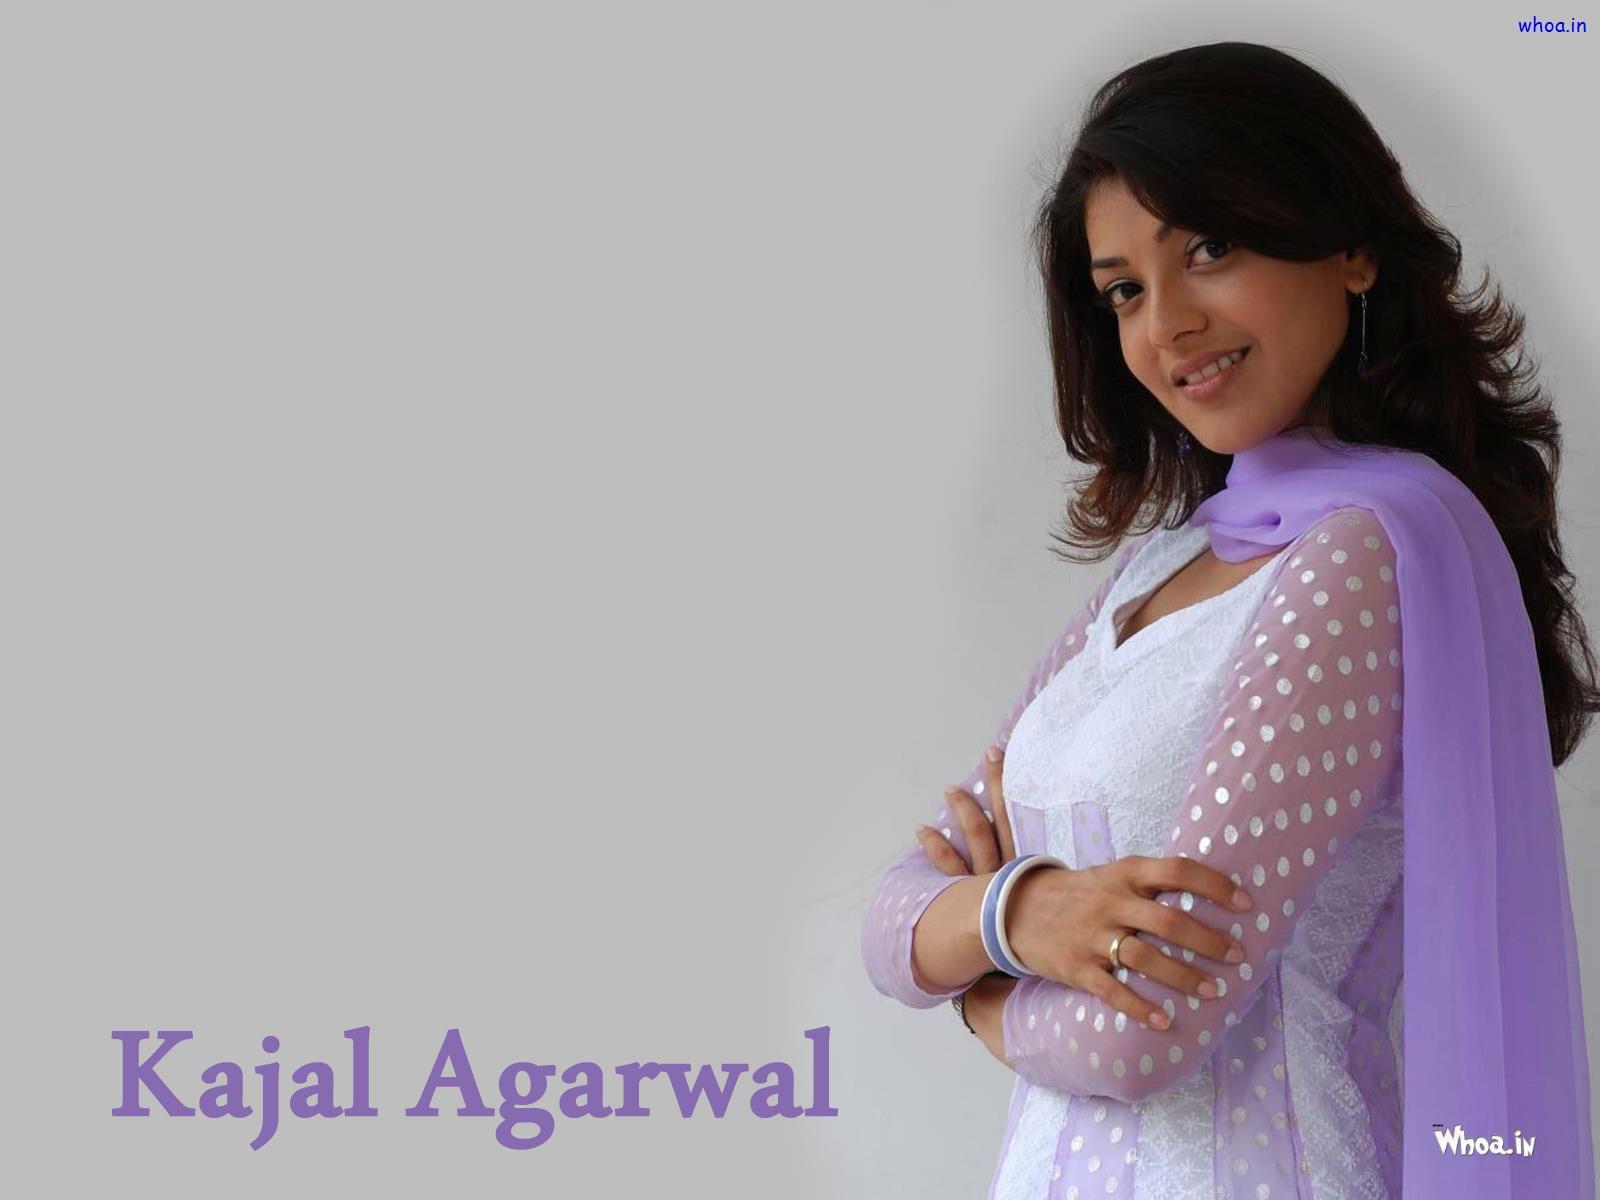 Kajal Agarwal In Simple White And Purple Dress